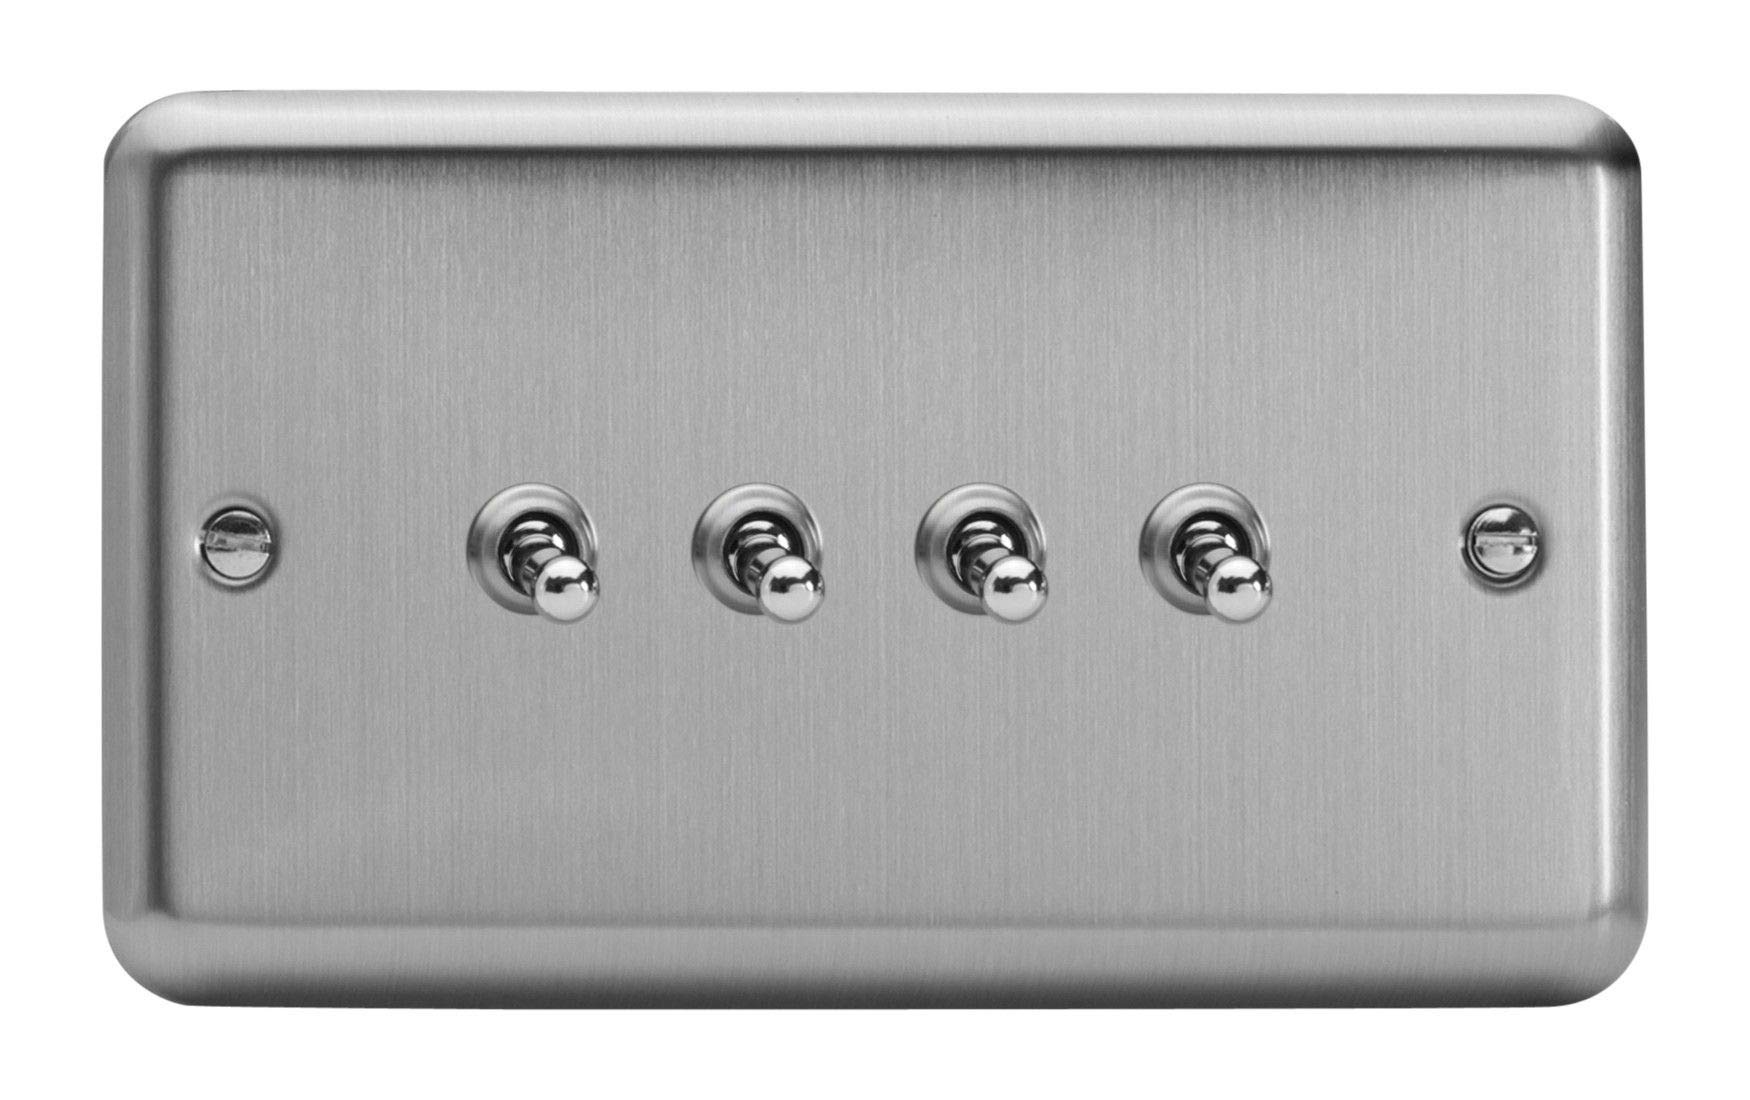 Varilight 4 Gang 10 Amp Toggle Switch Classic Matt Chrome XST9